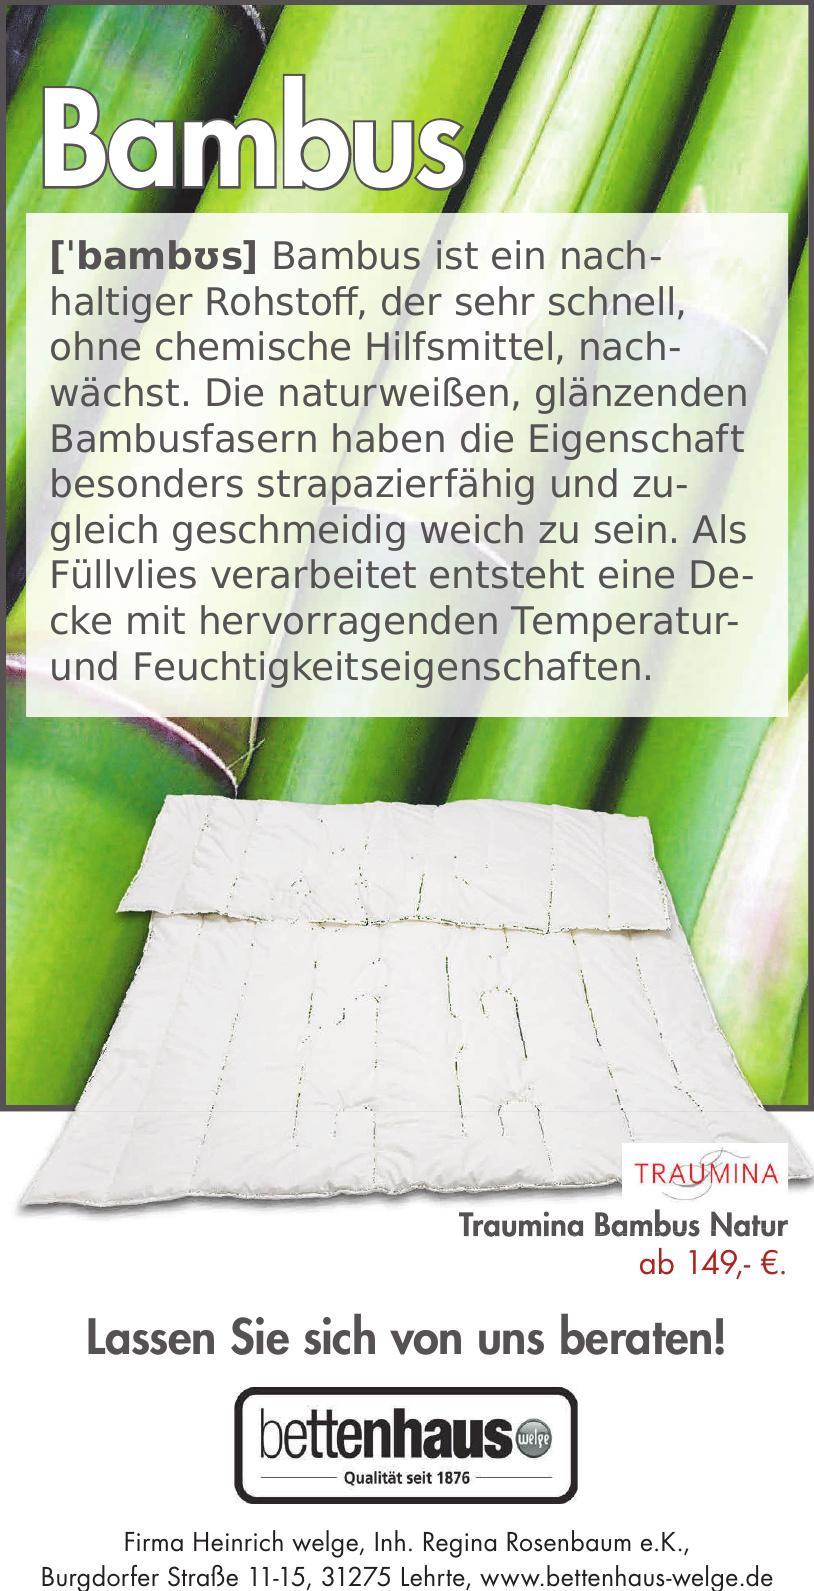 Firma Heinrich welge, Inh. Regina Rosenbaum e.K.